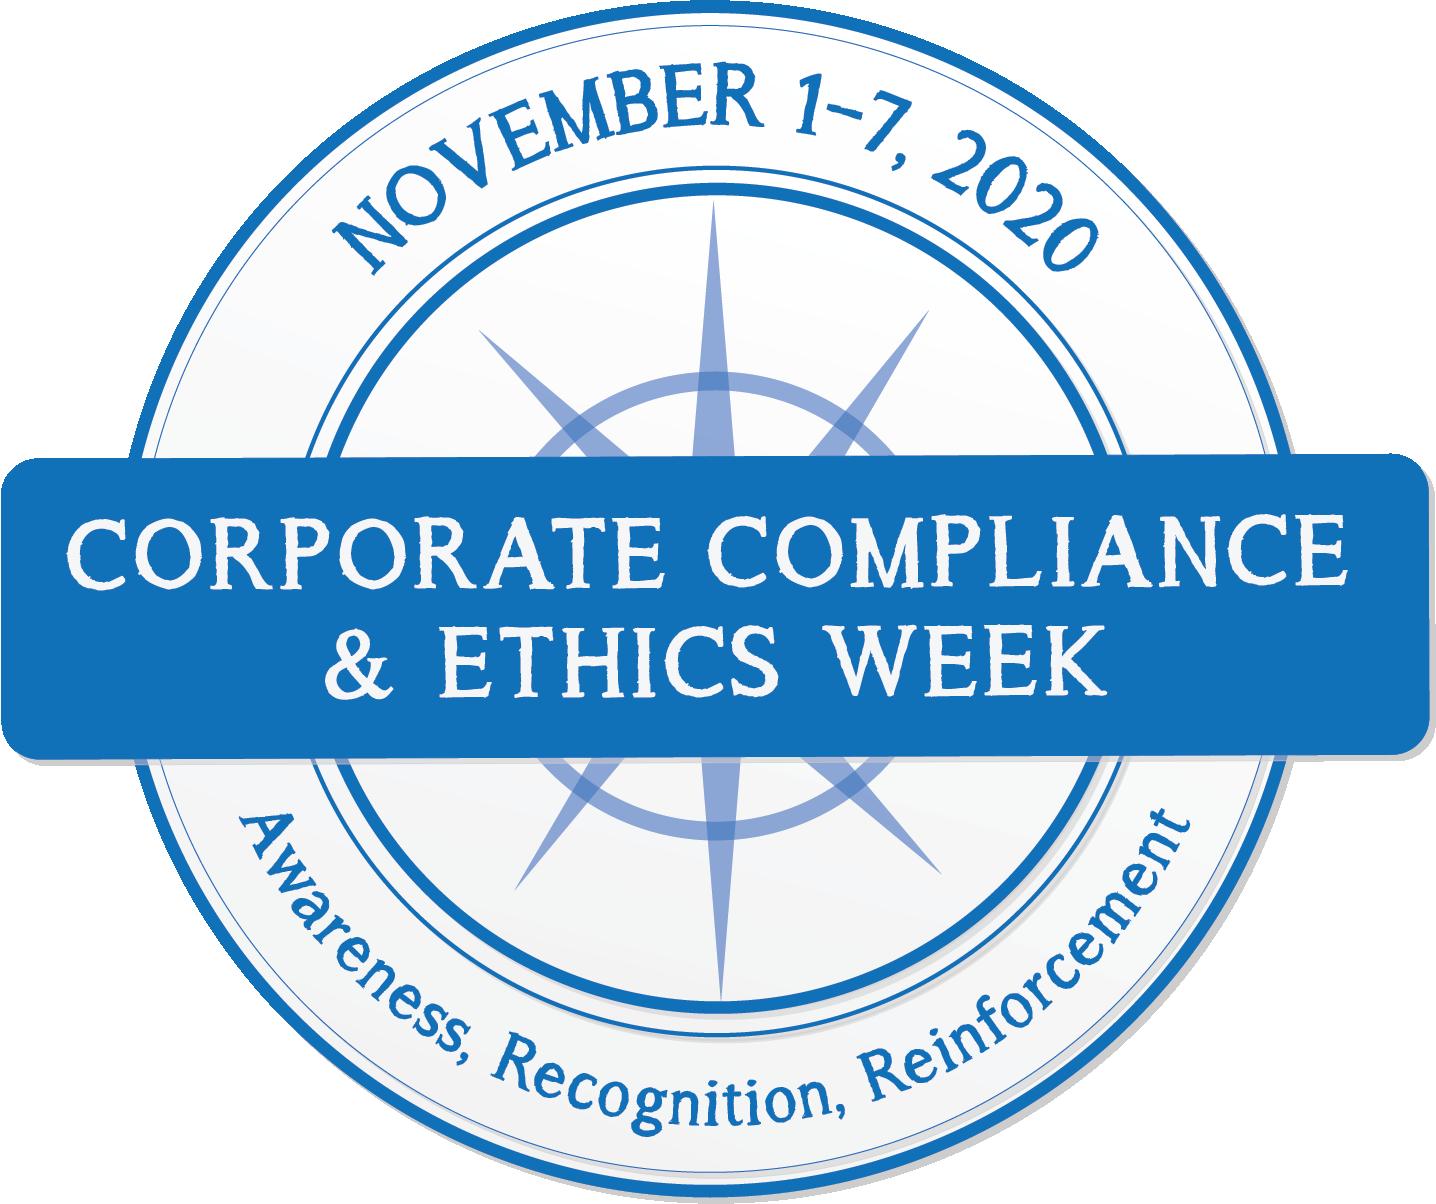 2020 Corporate Compliance & Ethics Week logo